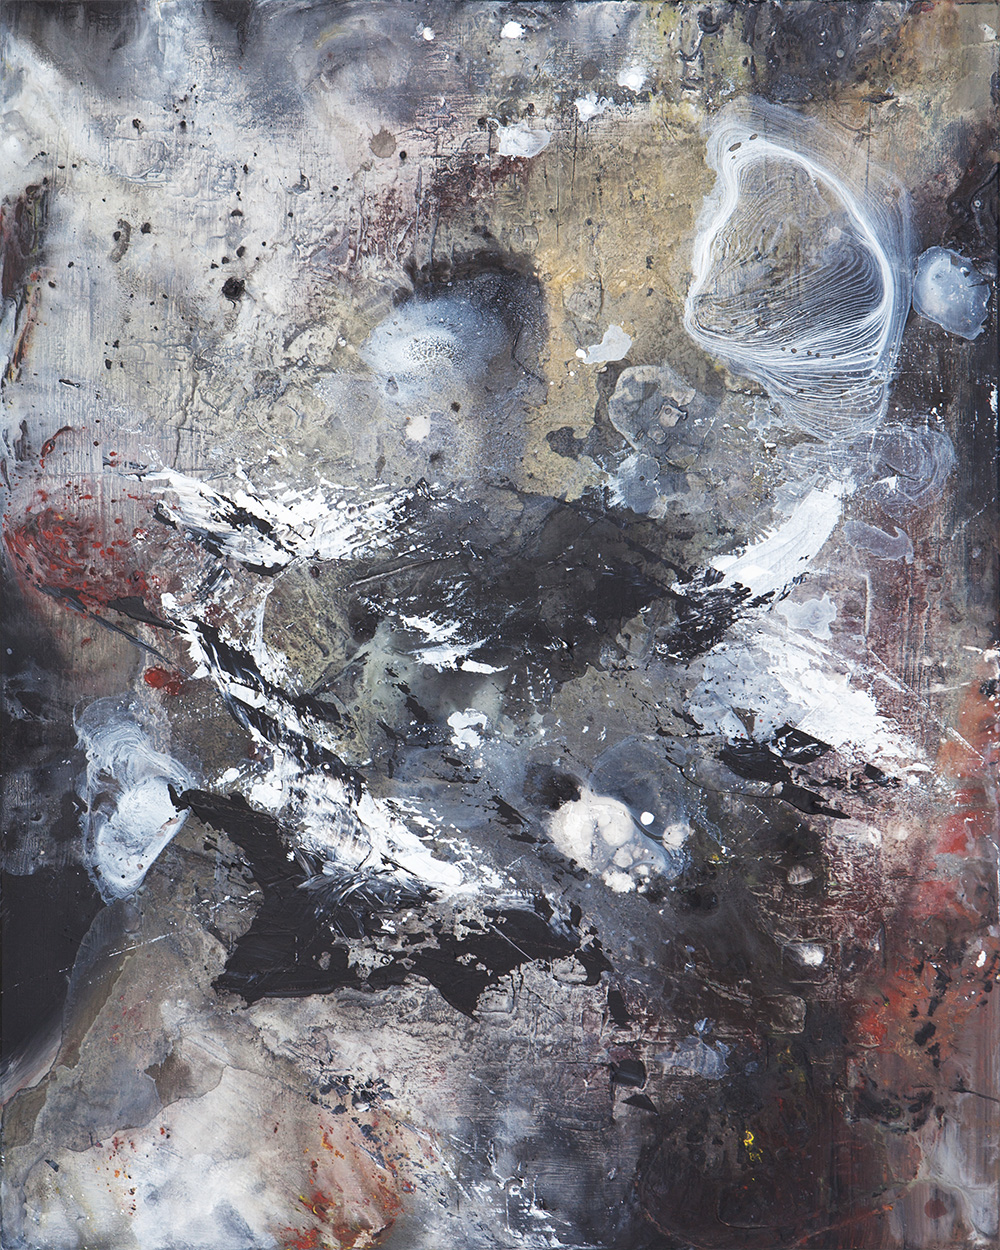 Weltenbummler | Acrylic, oil on canvas | 100x80cm | 2016